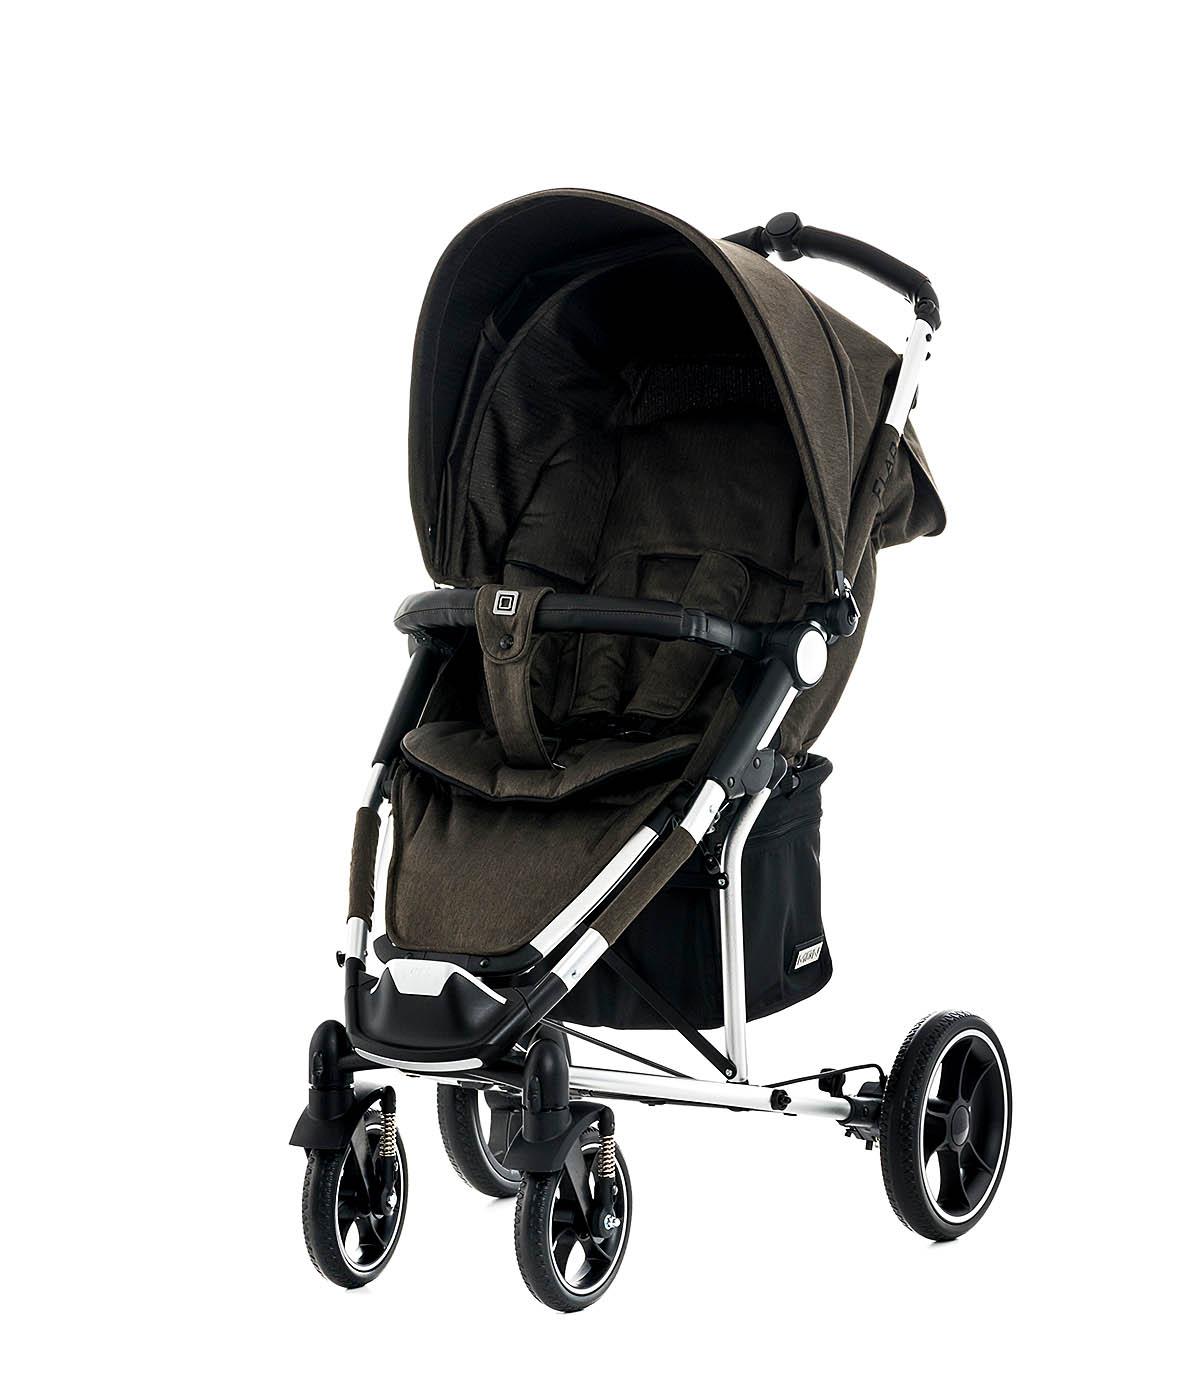 moon buggy flac 2018 brown fishbone buy at kidsroom strollers. Black Bedroom Furniture Sets. Home Design Ideas